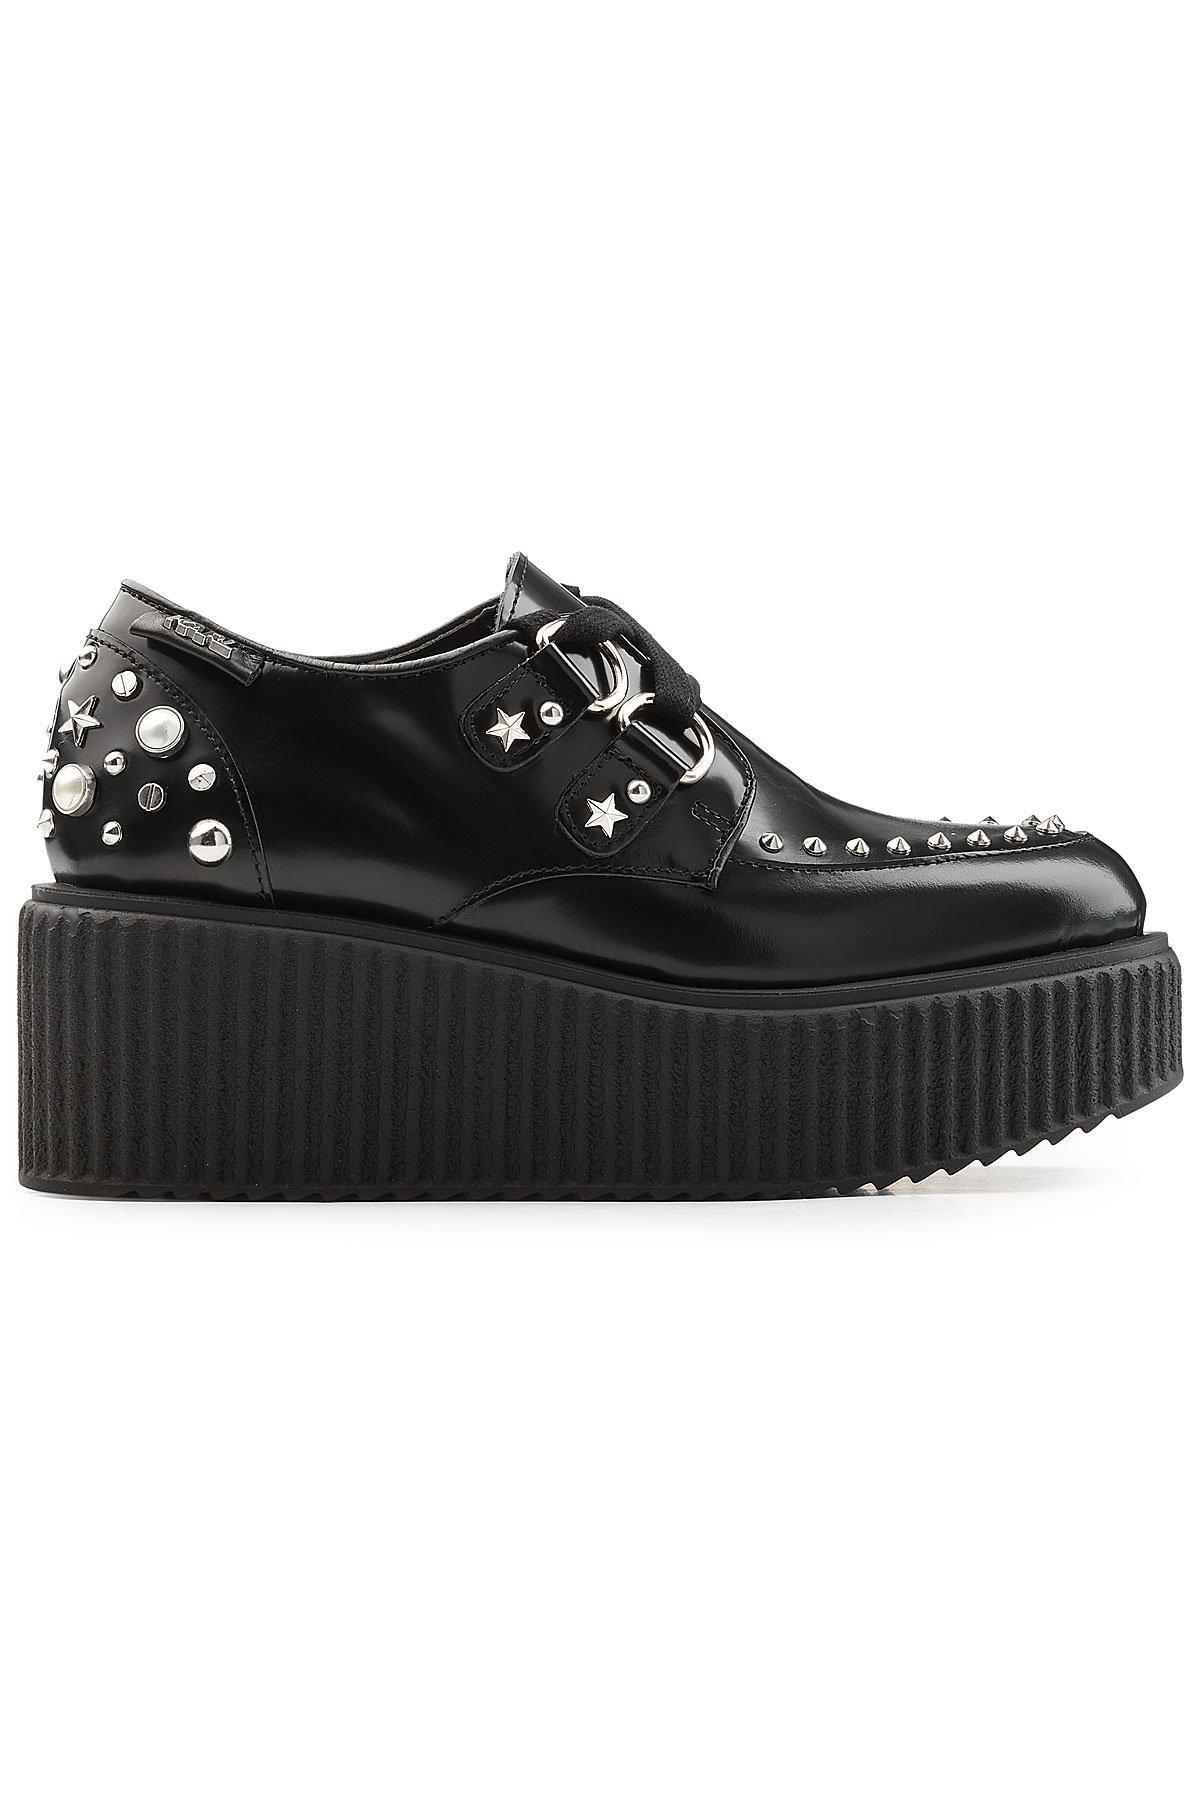 d968b956bd9c Lyst - Karl Lagerfeld Embellished Leather Platform Creepers in Black